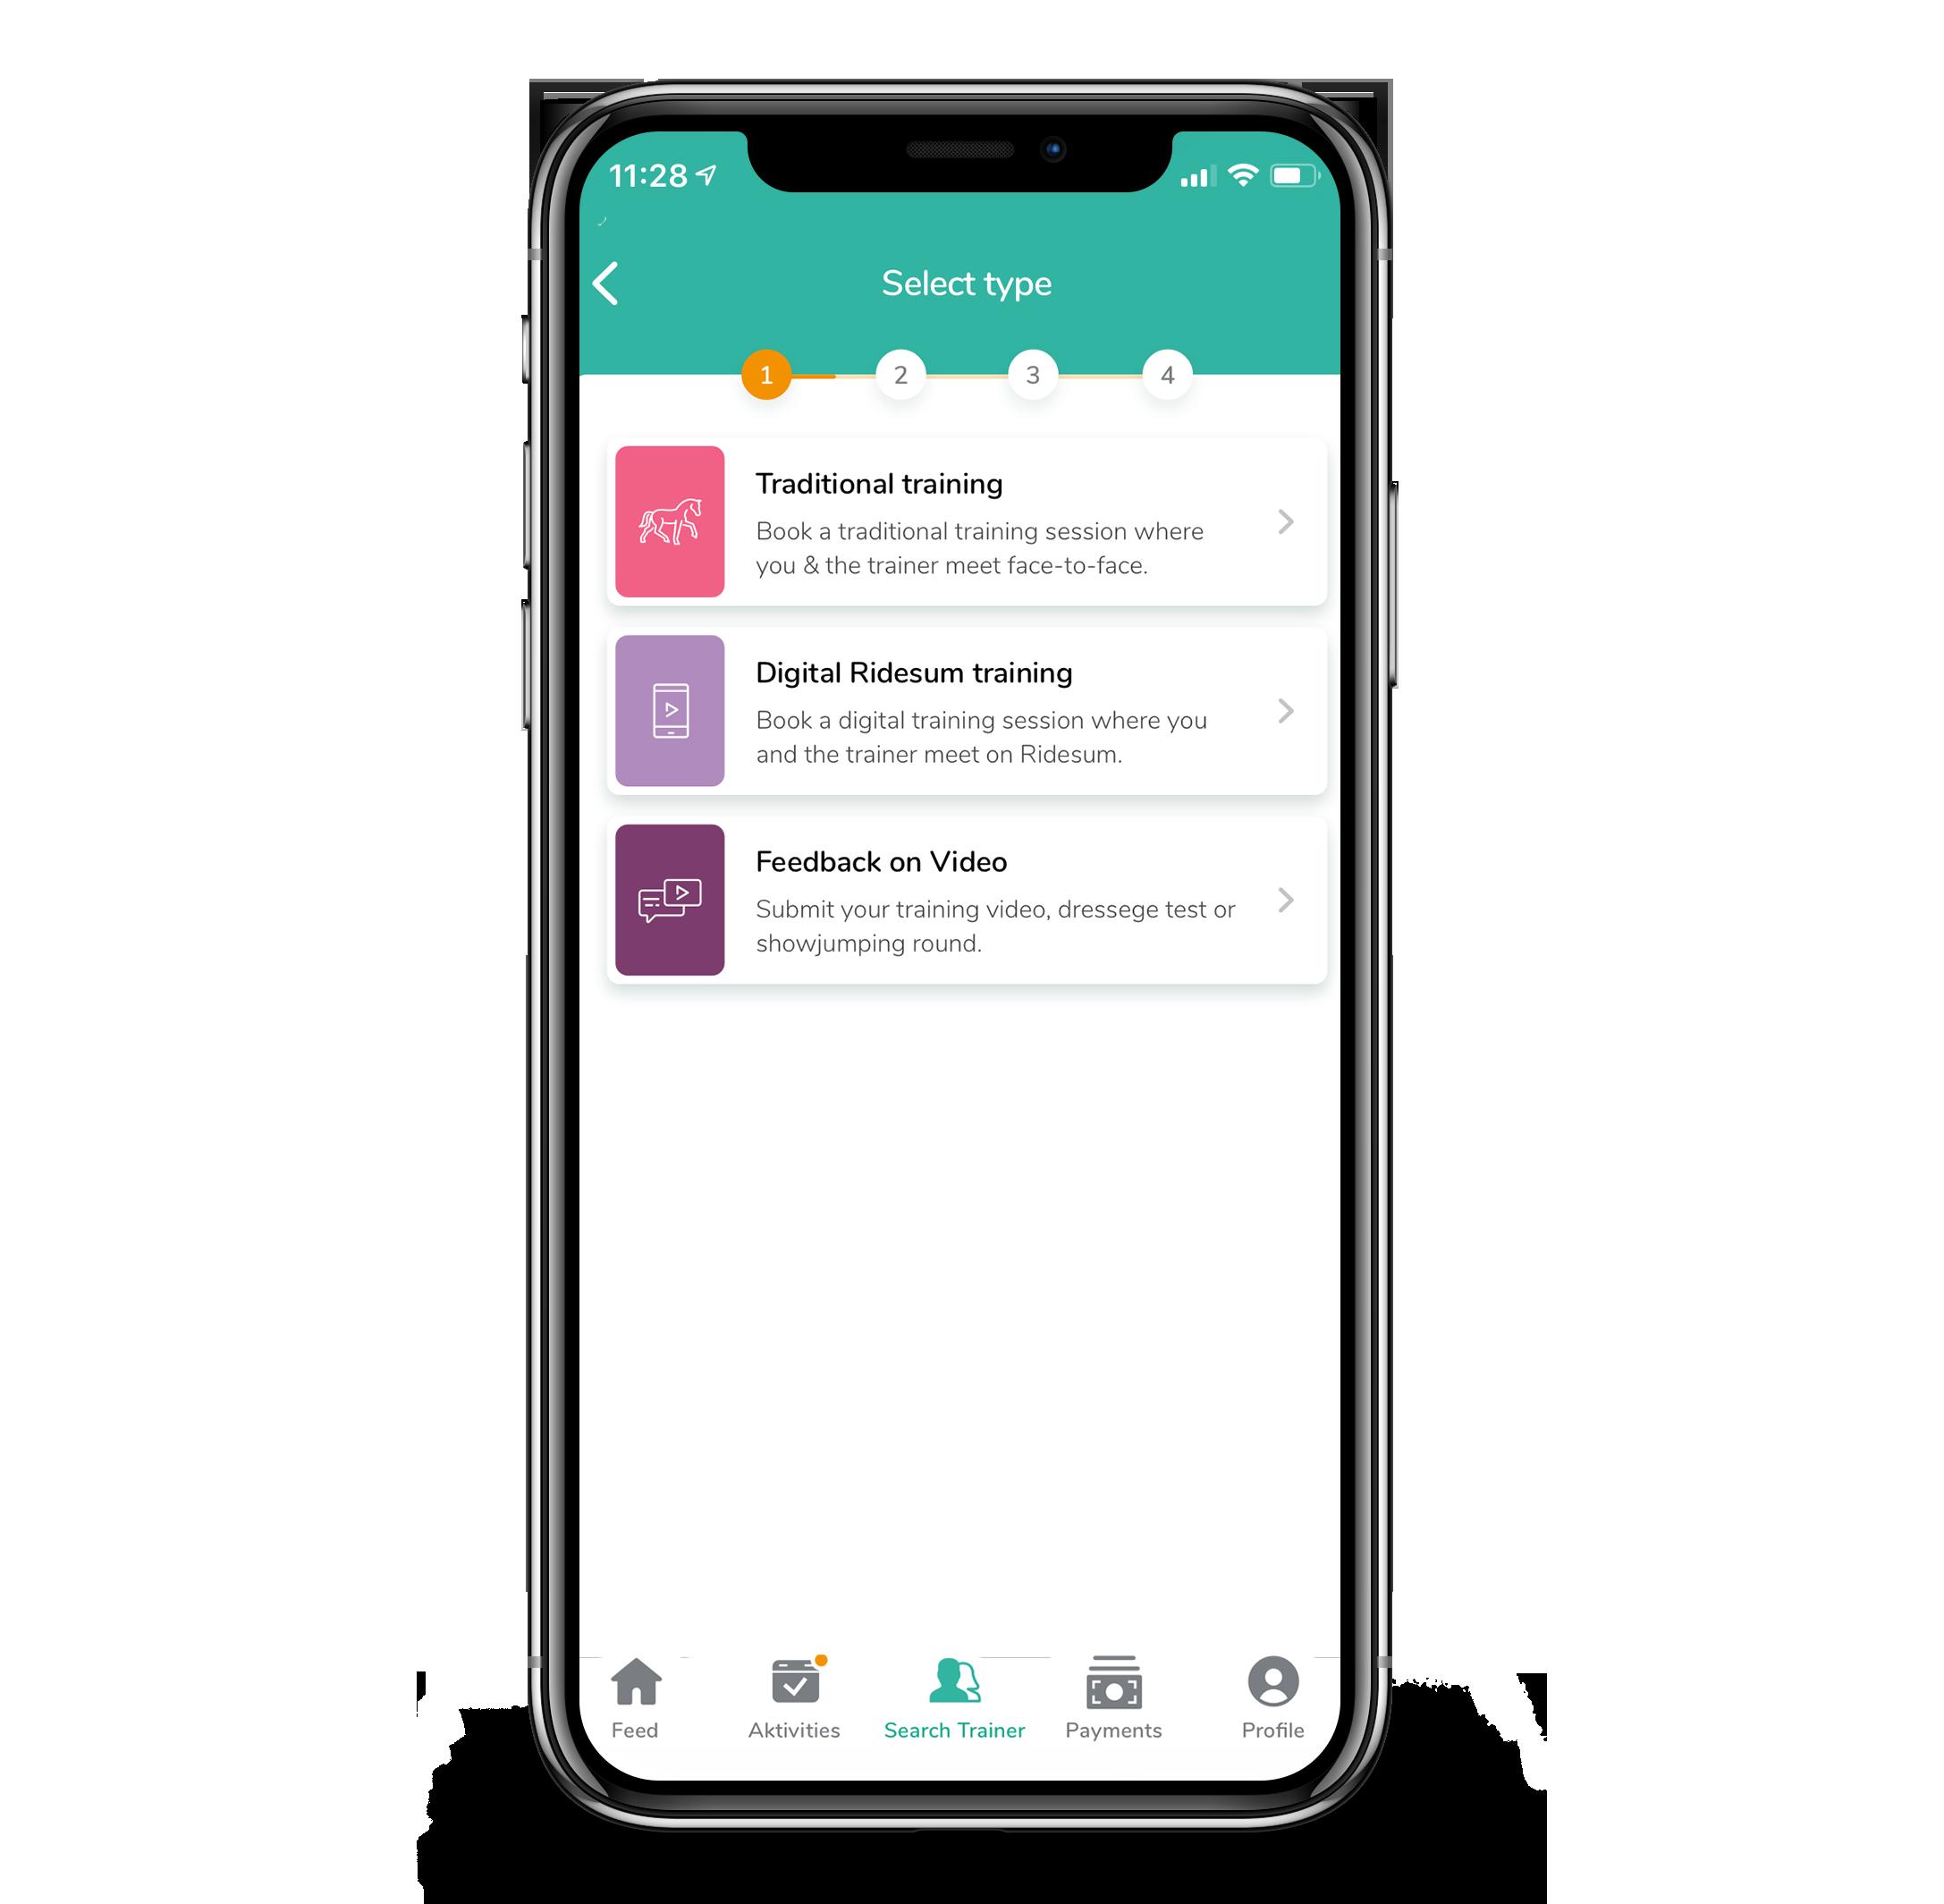 Image: Book all types of classes through our Ridesum app